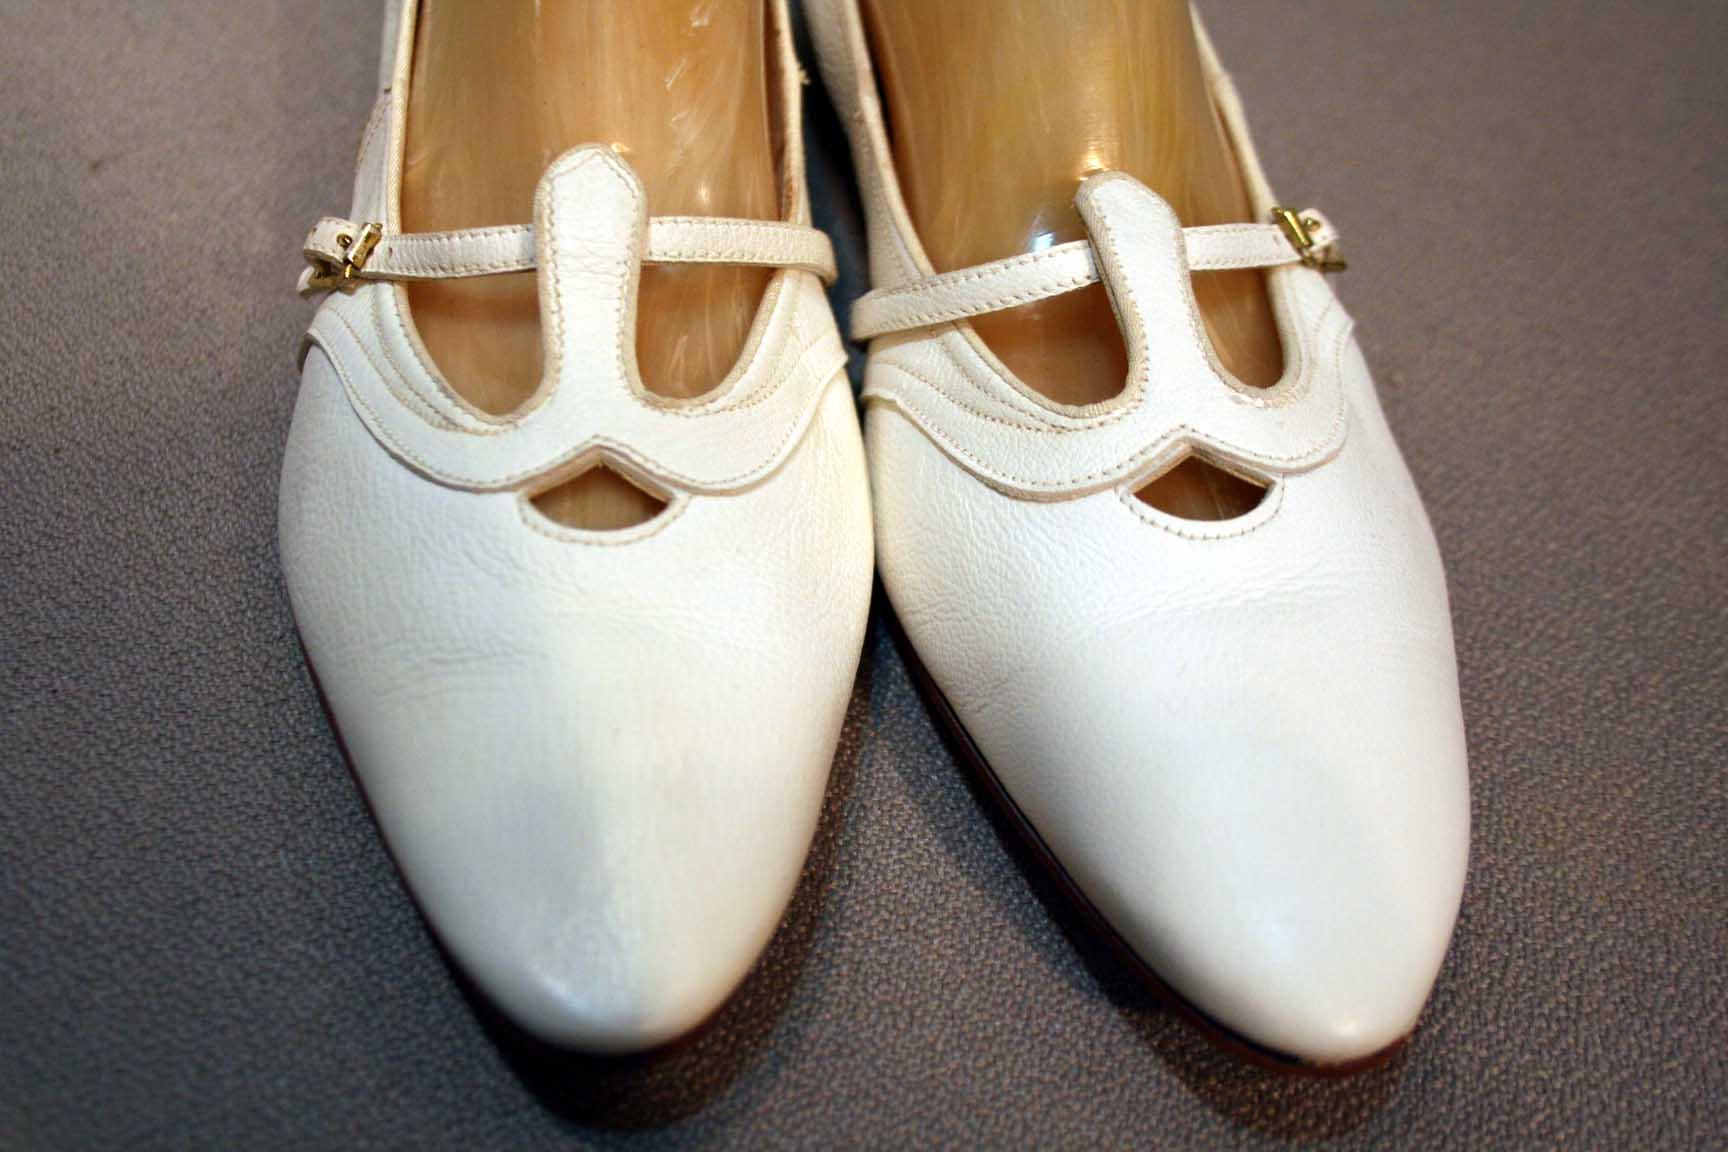 Do Uk Shoe Sizes Run Smaller Than Us